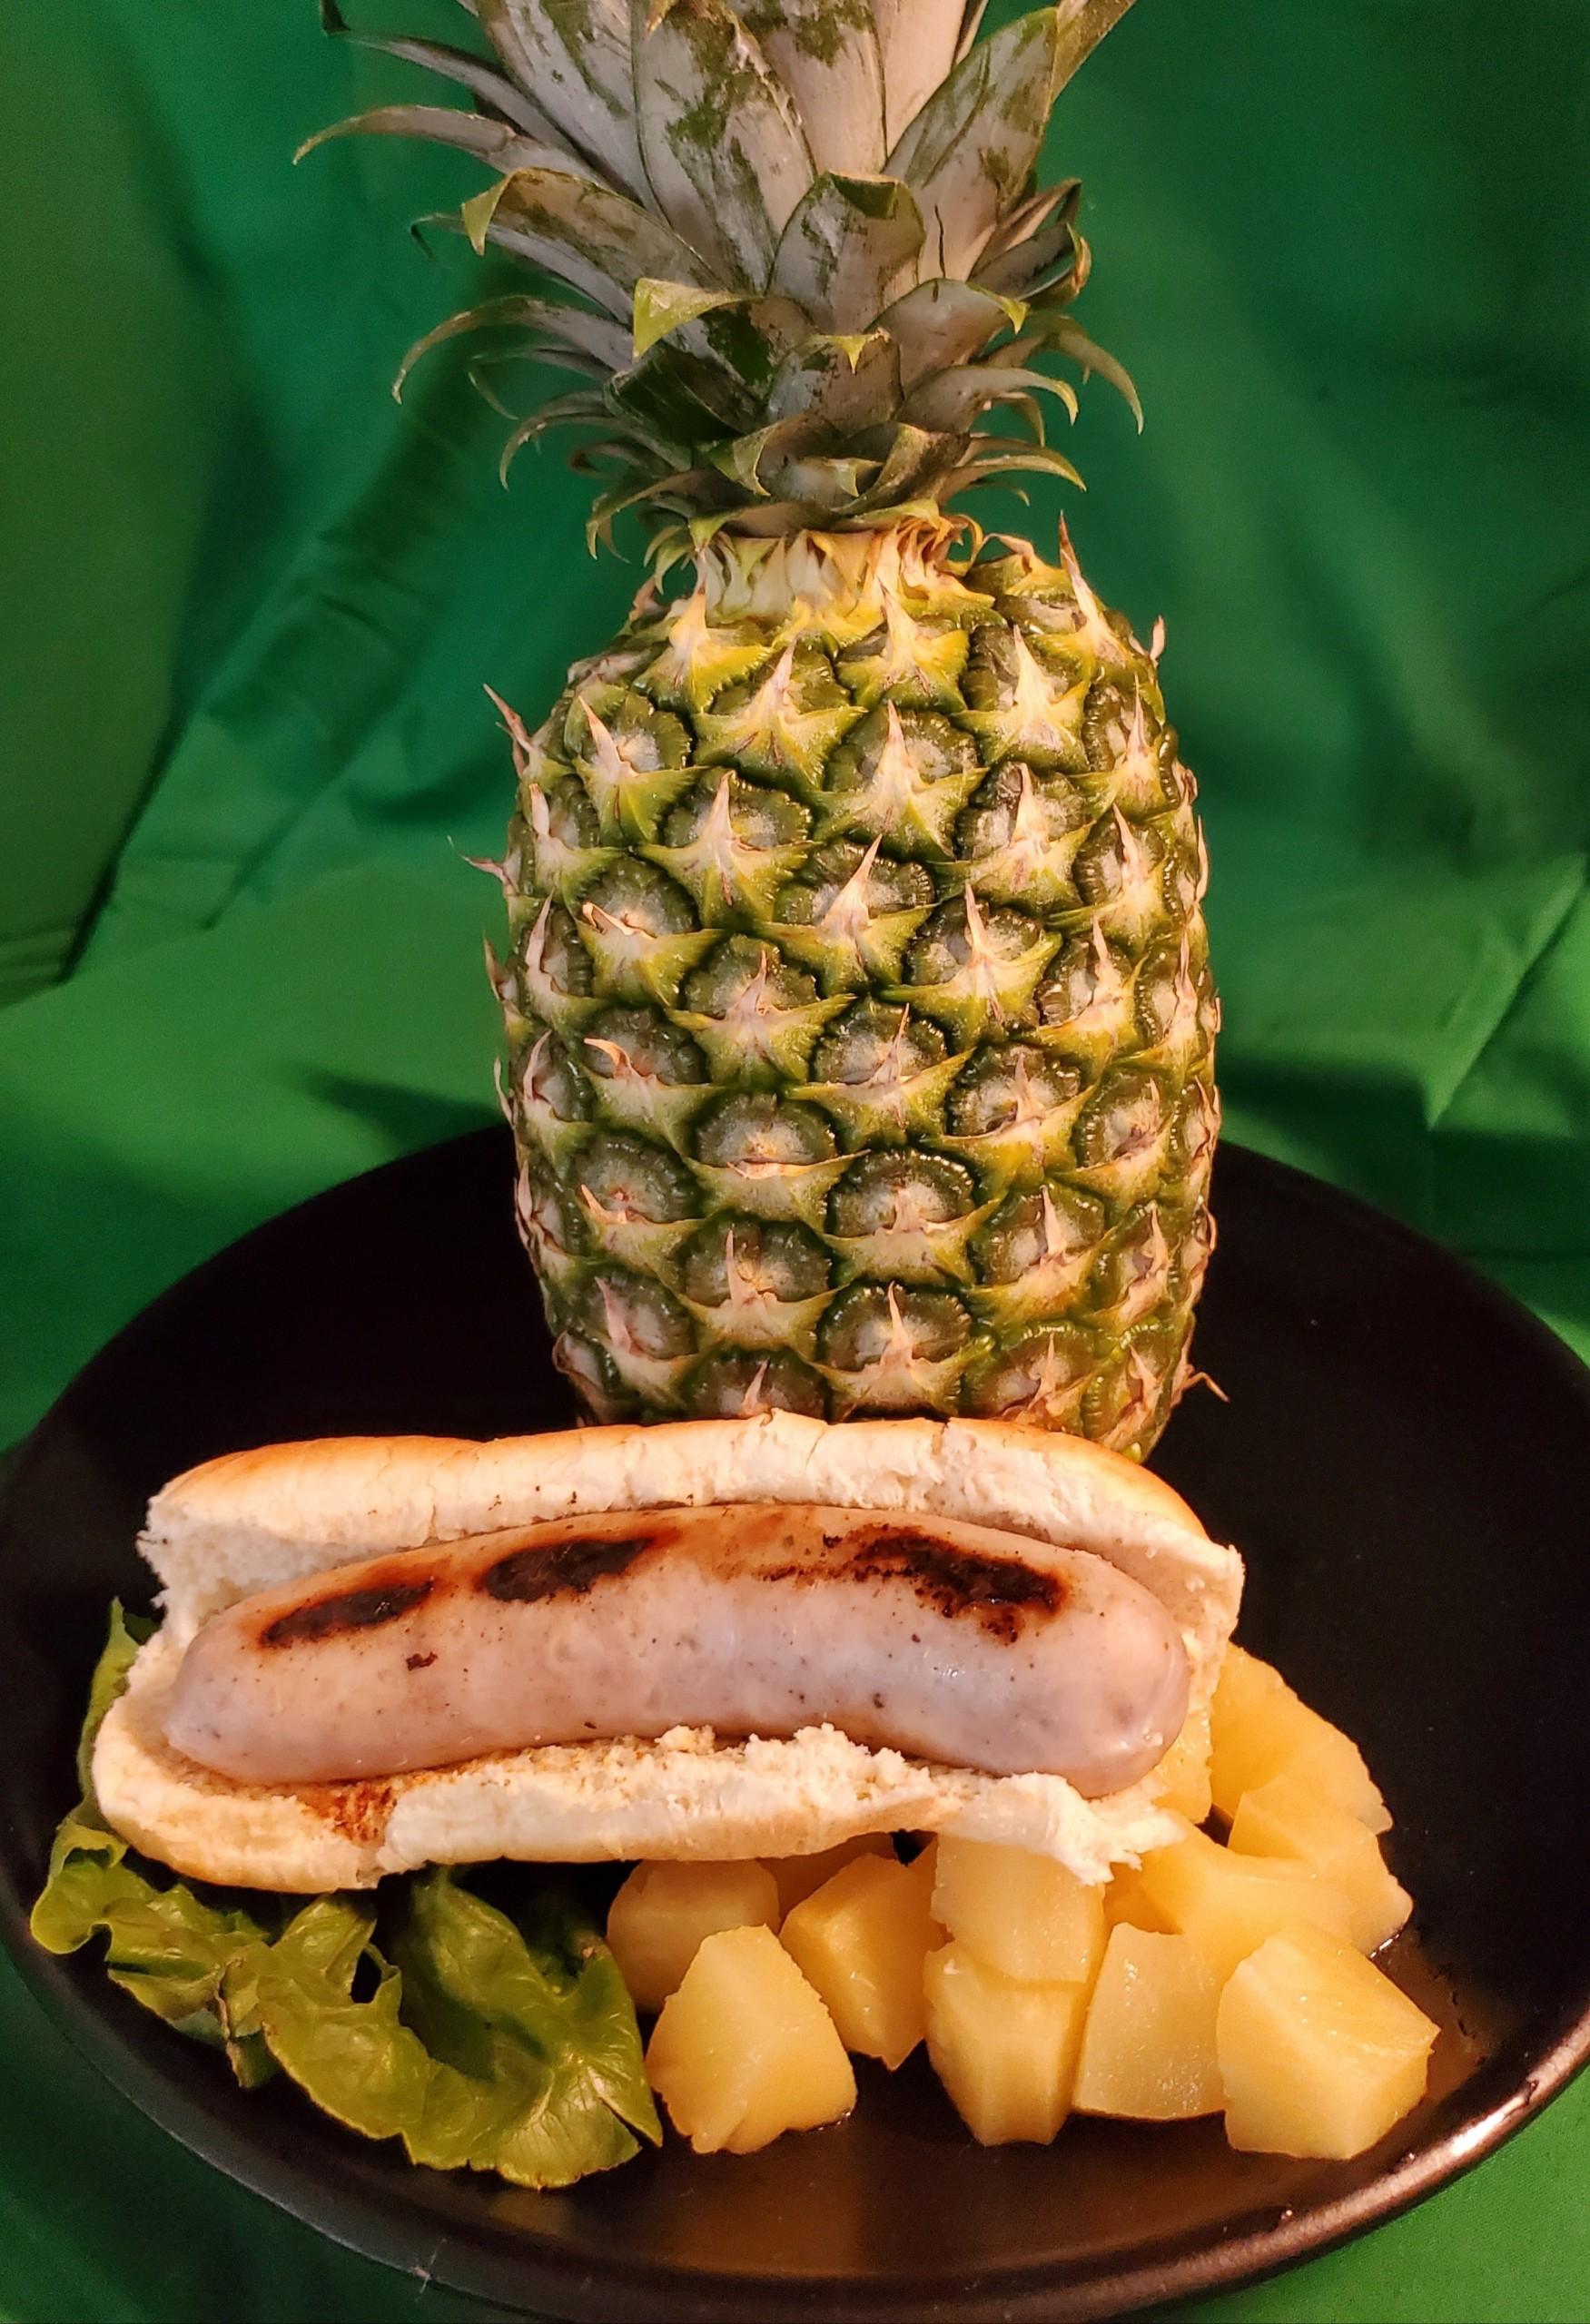 Scherer Custom Meats - Pineapple Brats